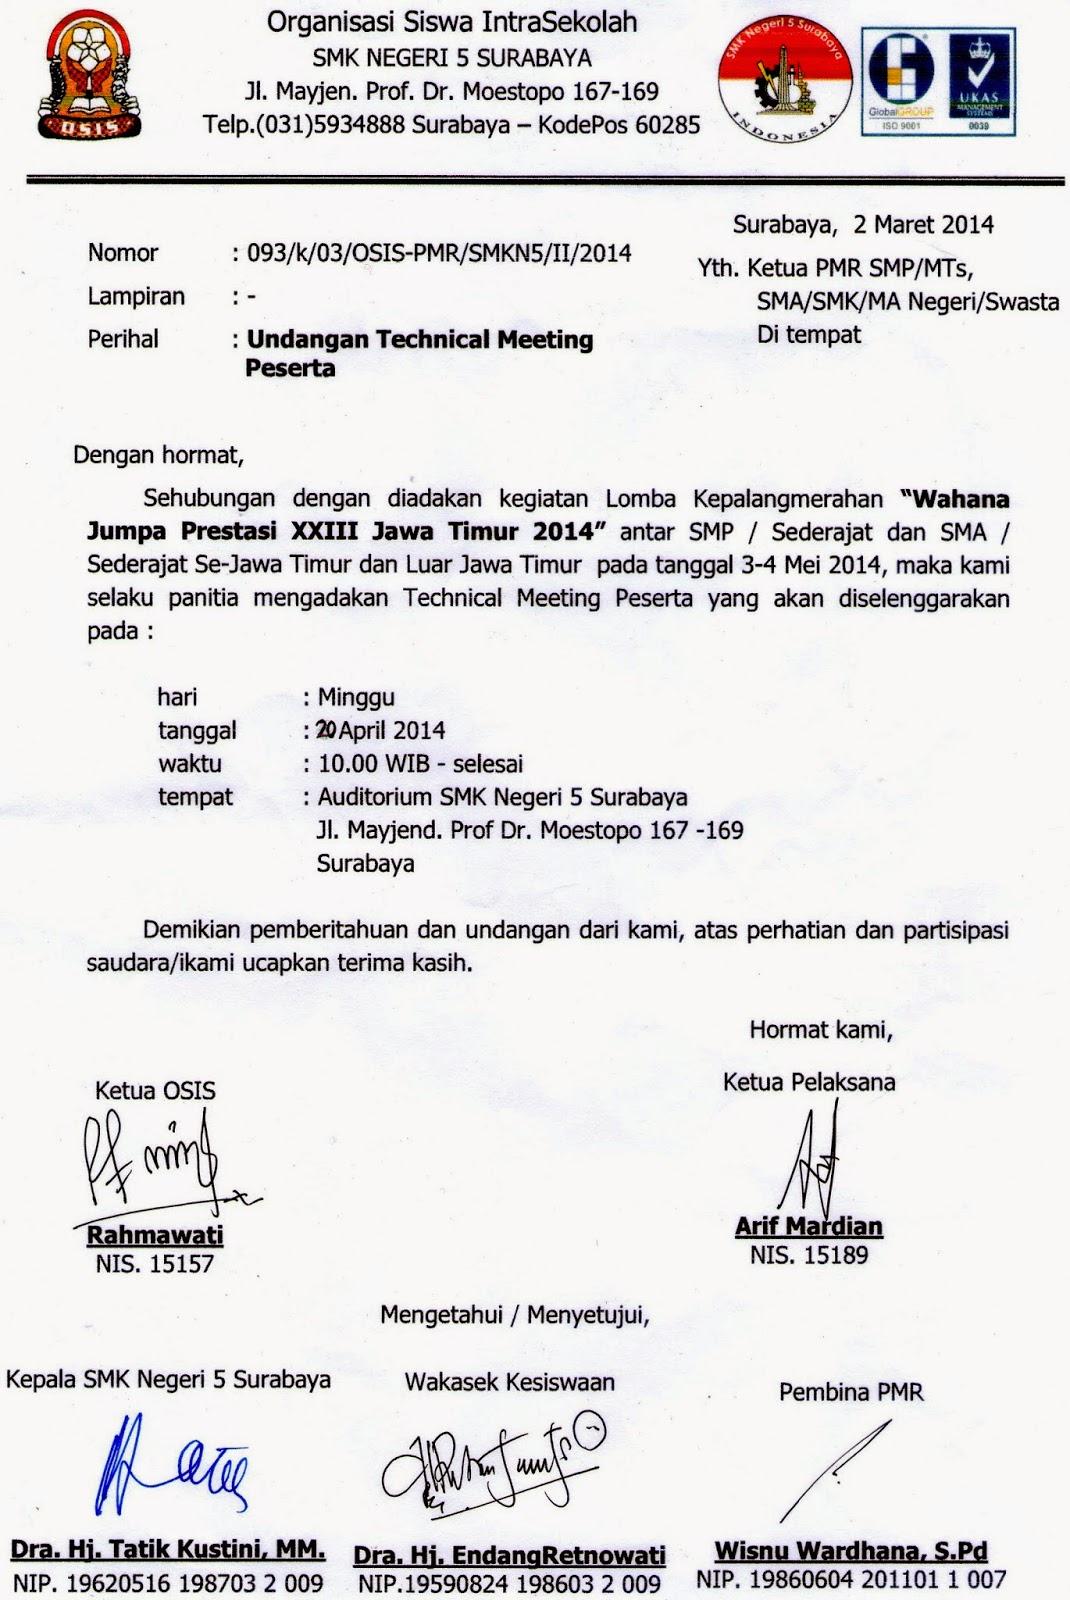 Contoh Surat Undangan Meeting Bahasa Inggris